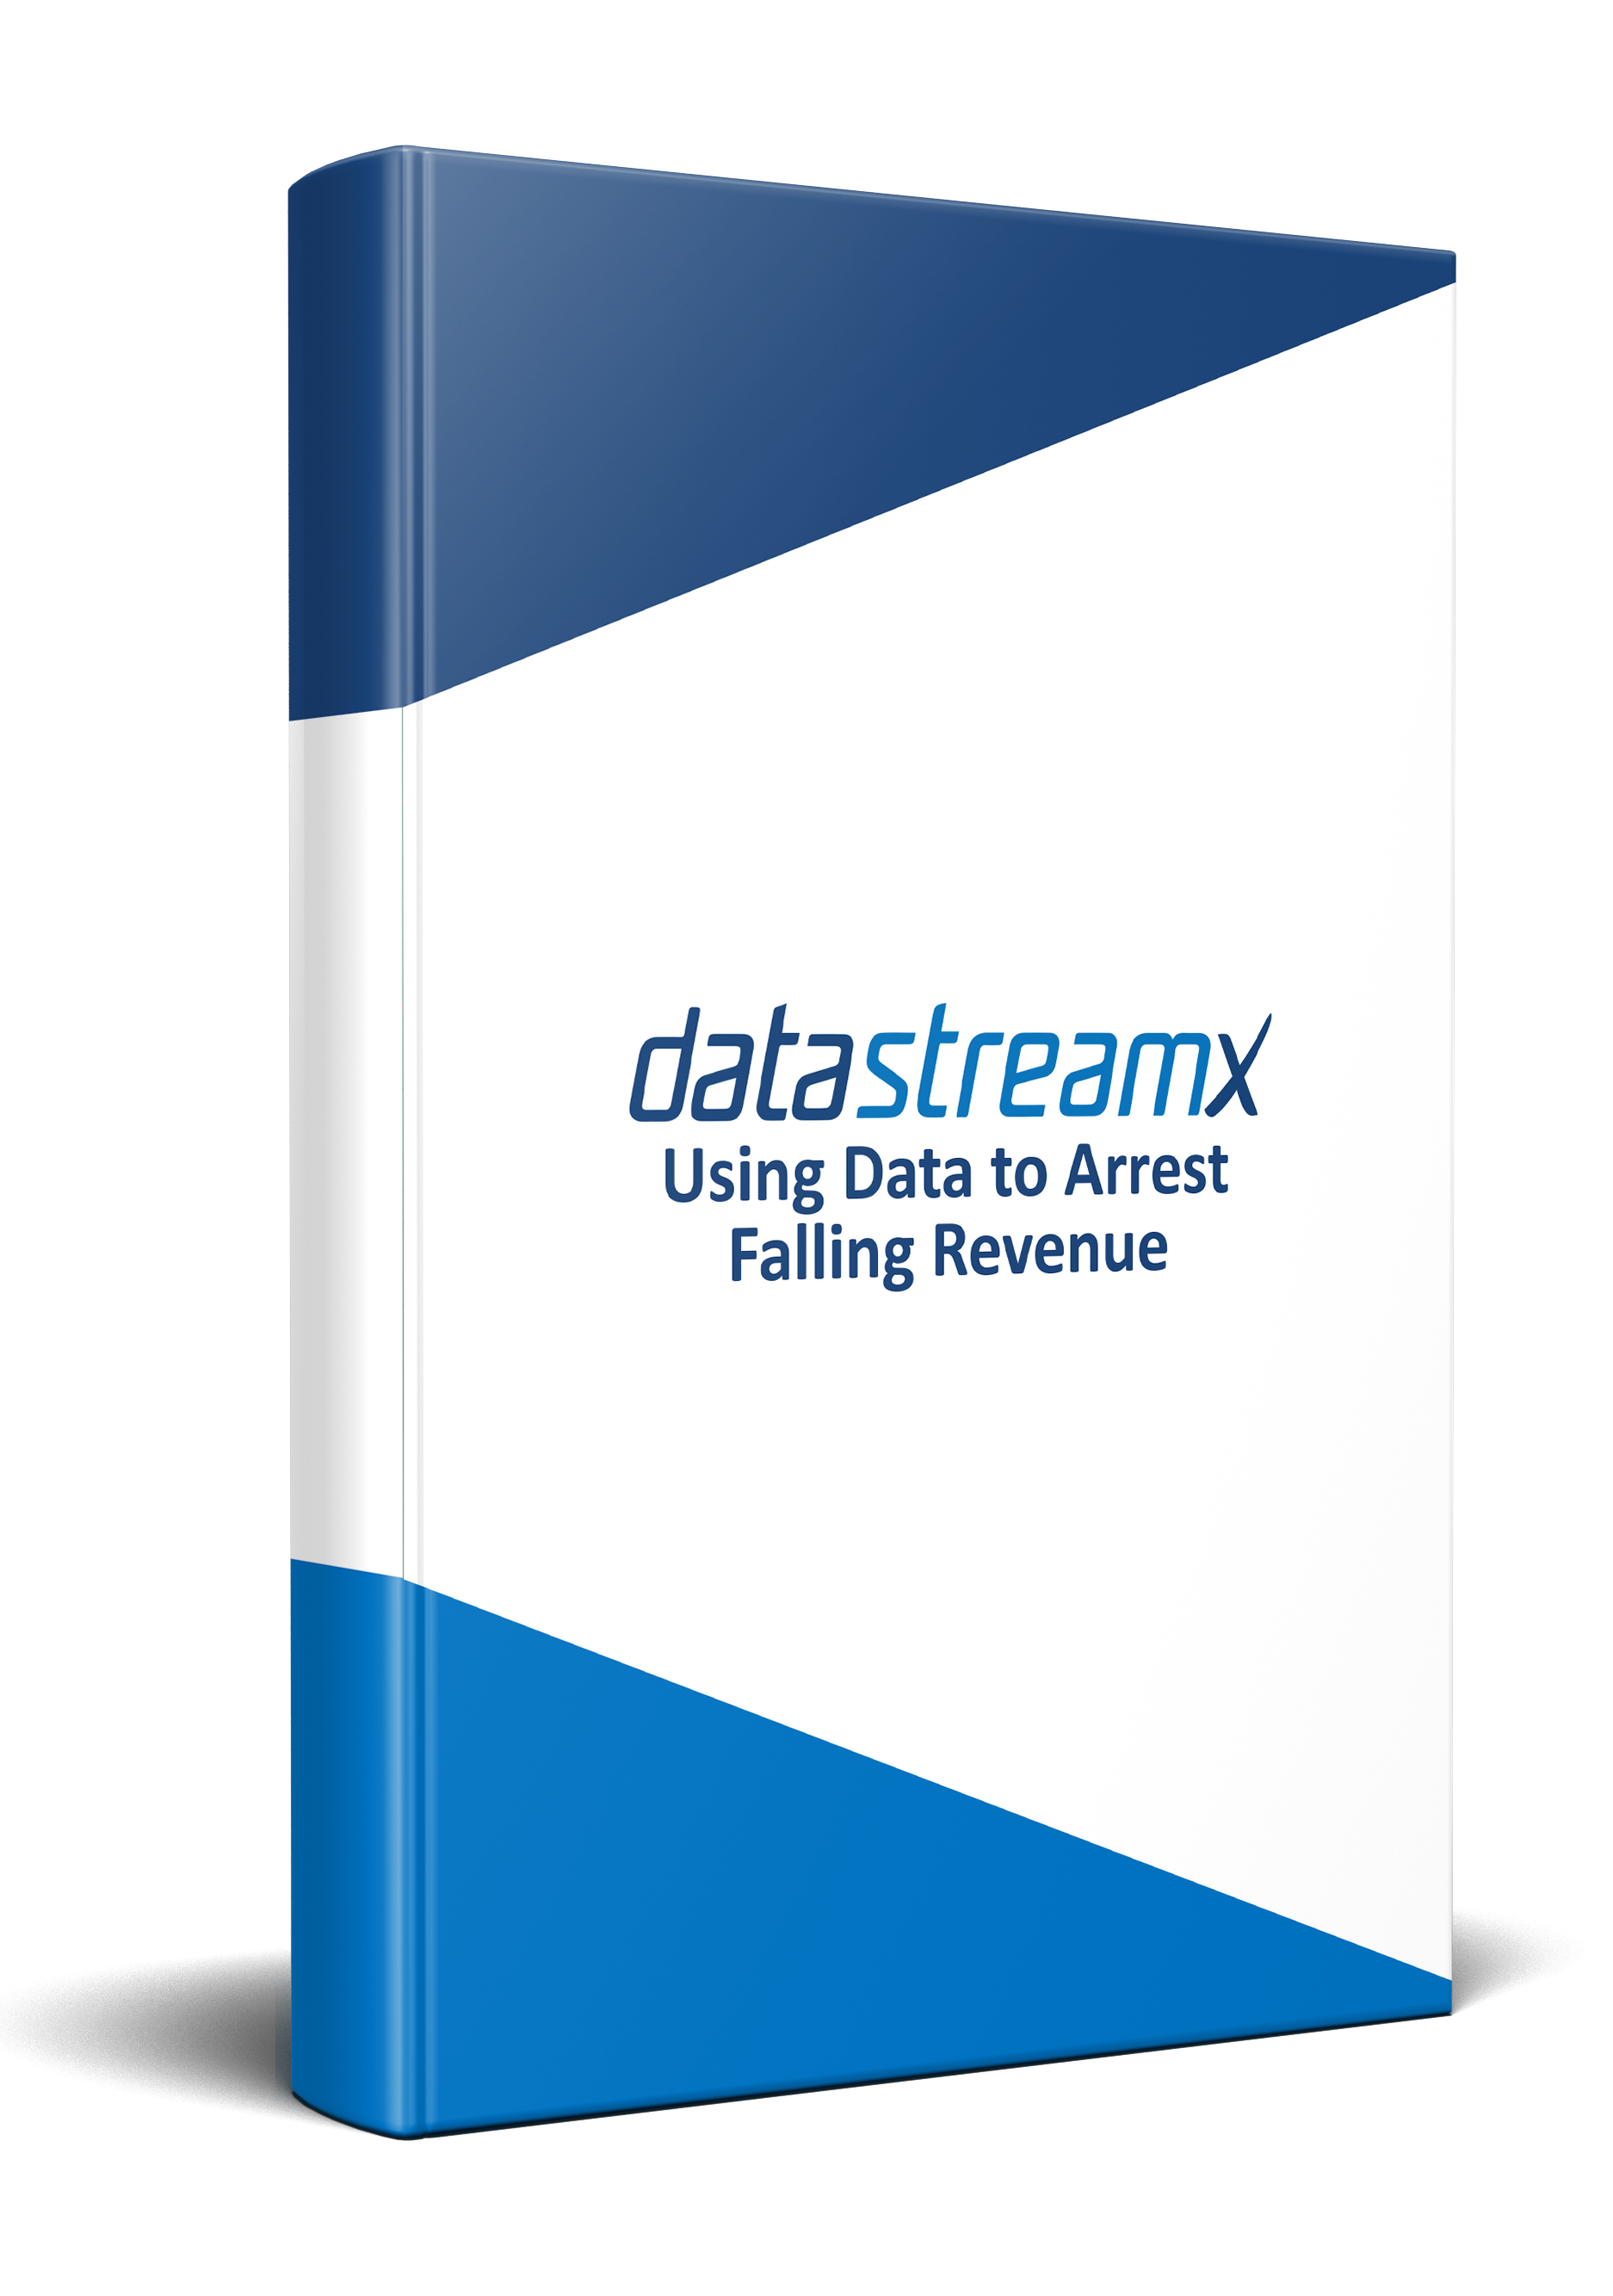 Using Data to Arrest Falling Revenue